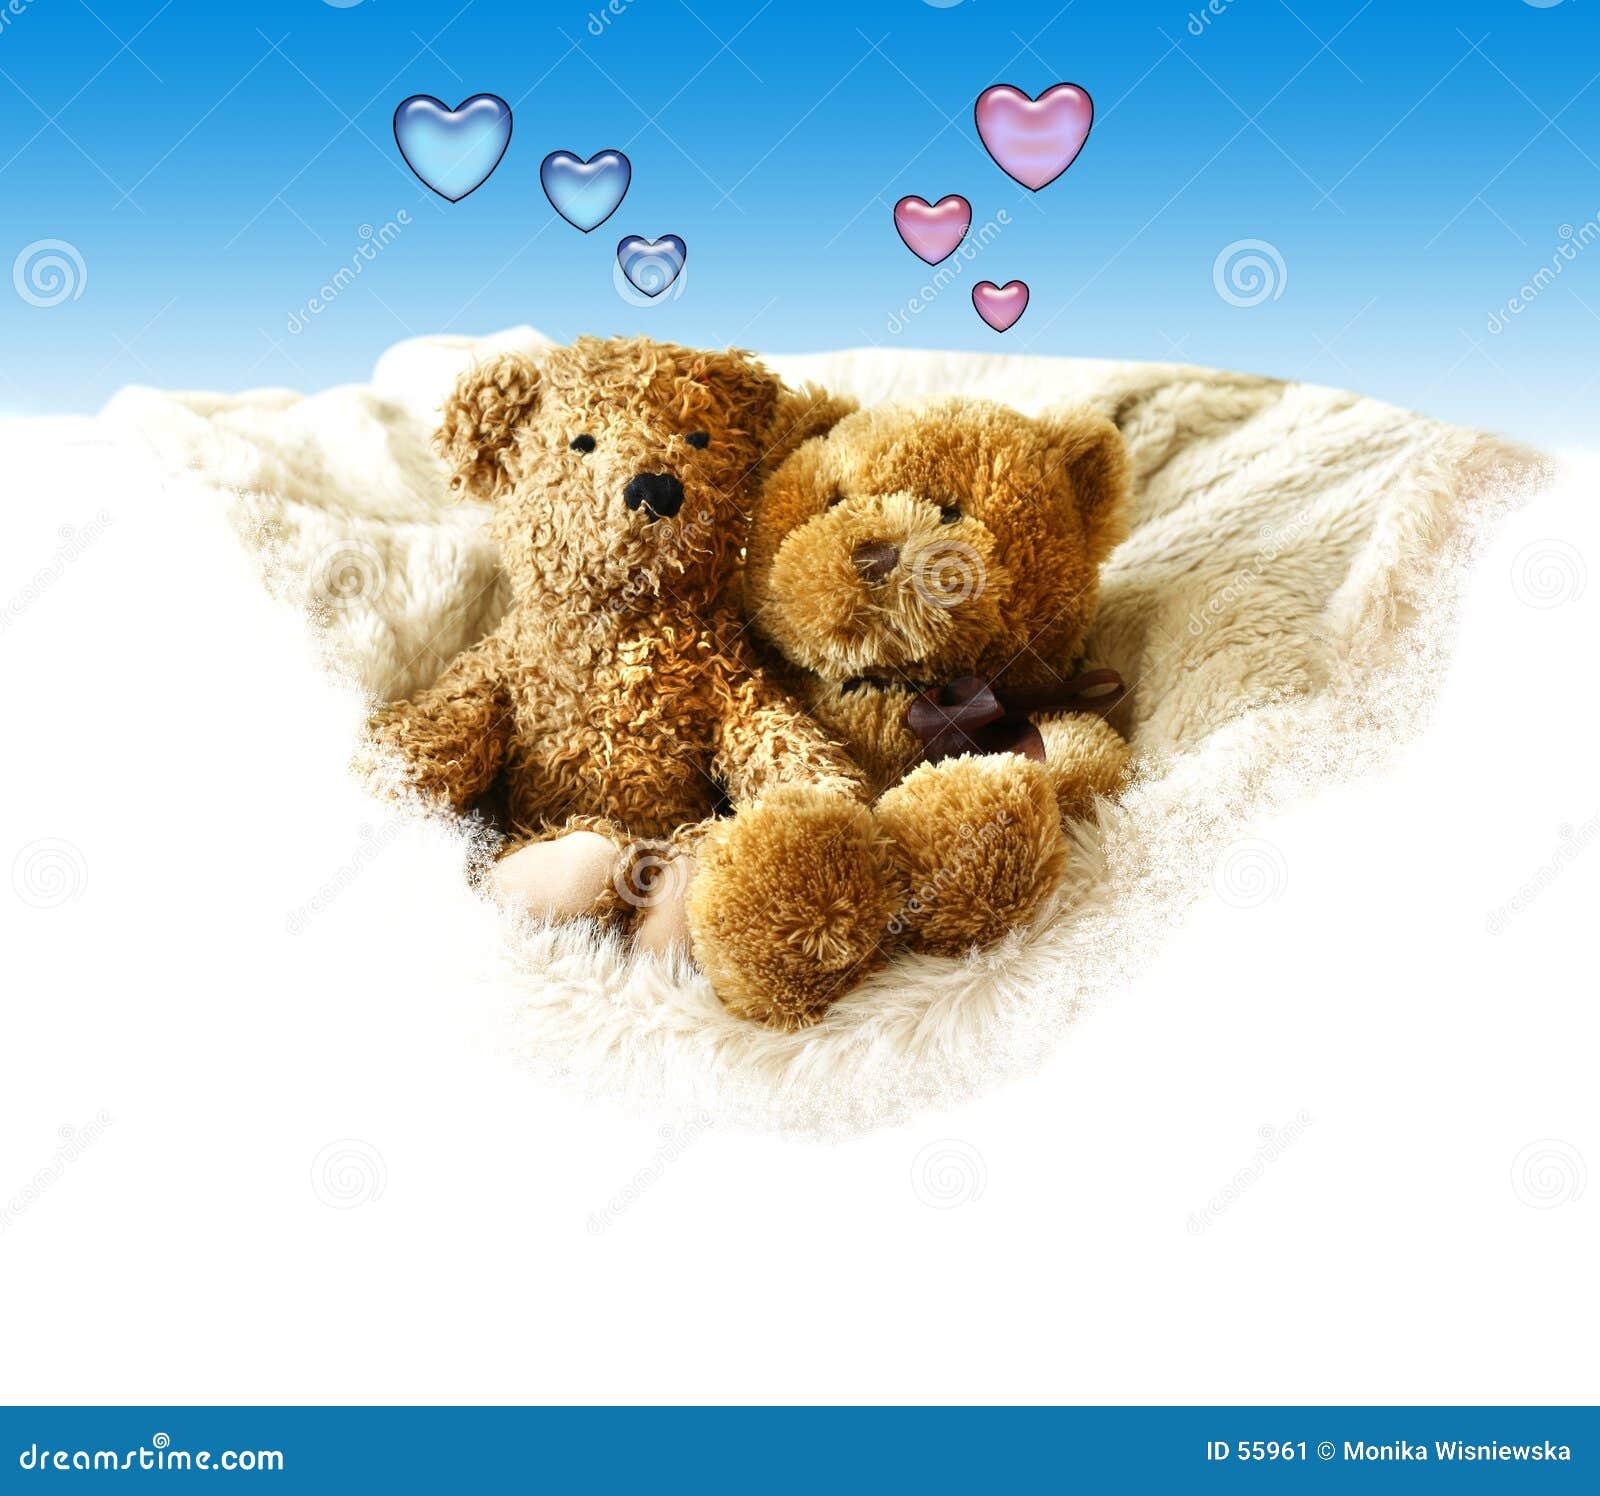 Download Valentines - Teddybears image stock. Image du amour, brun - 55961